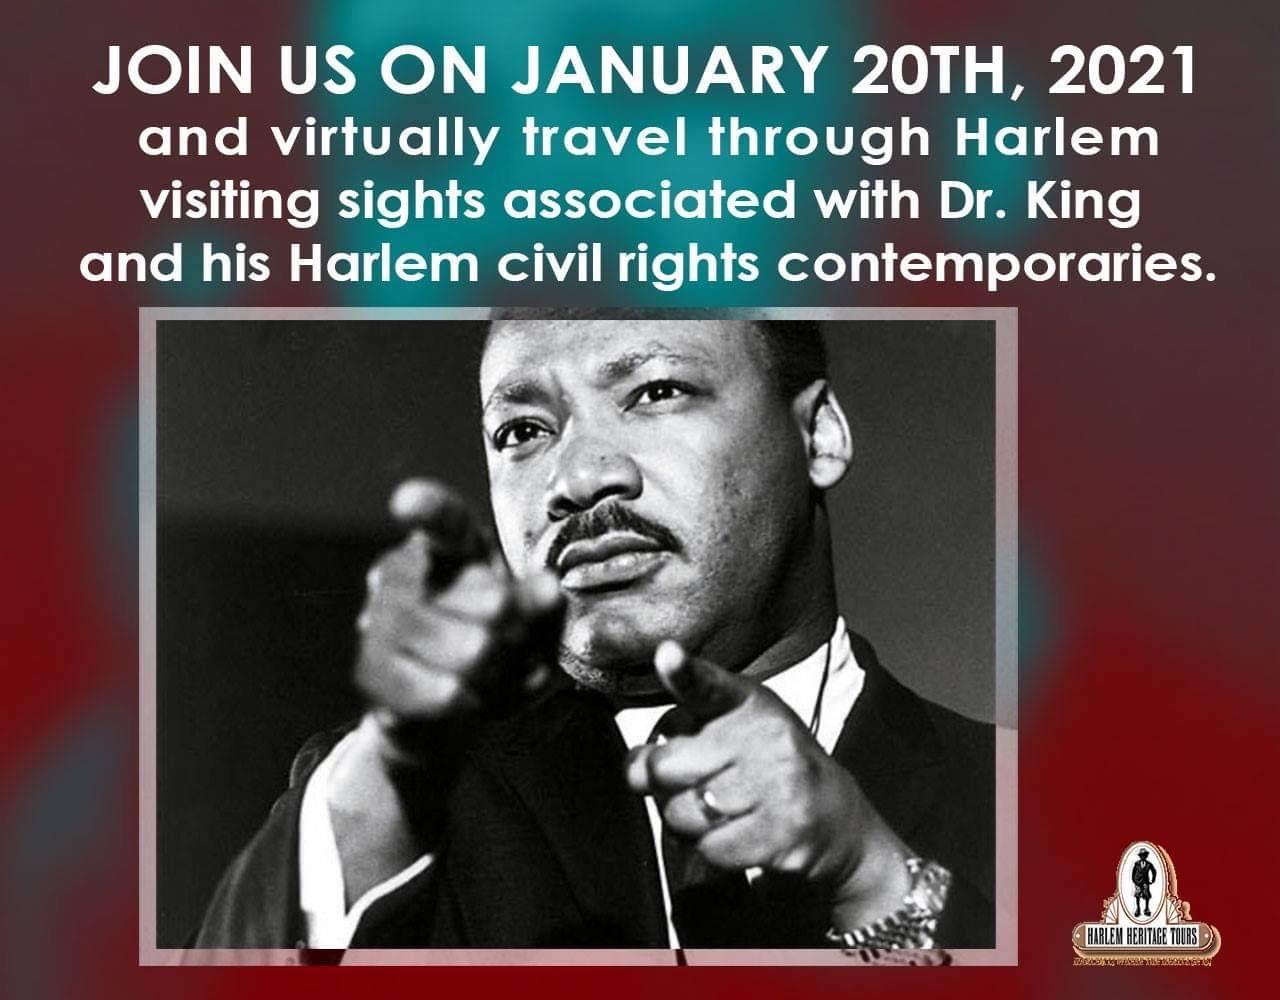 Dr. Martin Luther King Jr. Virtual Harlem Tour